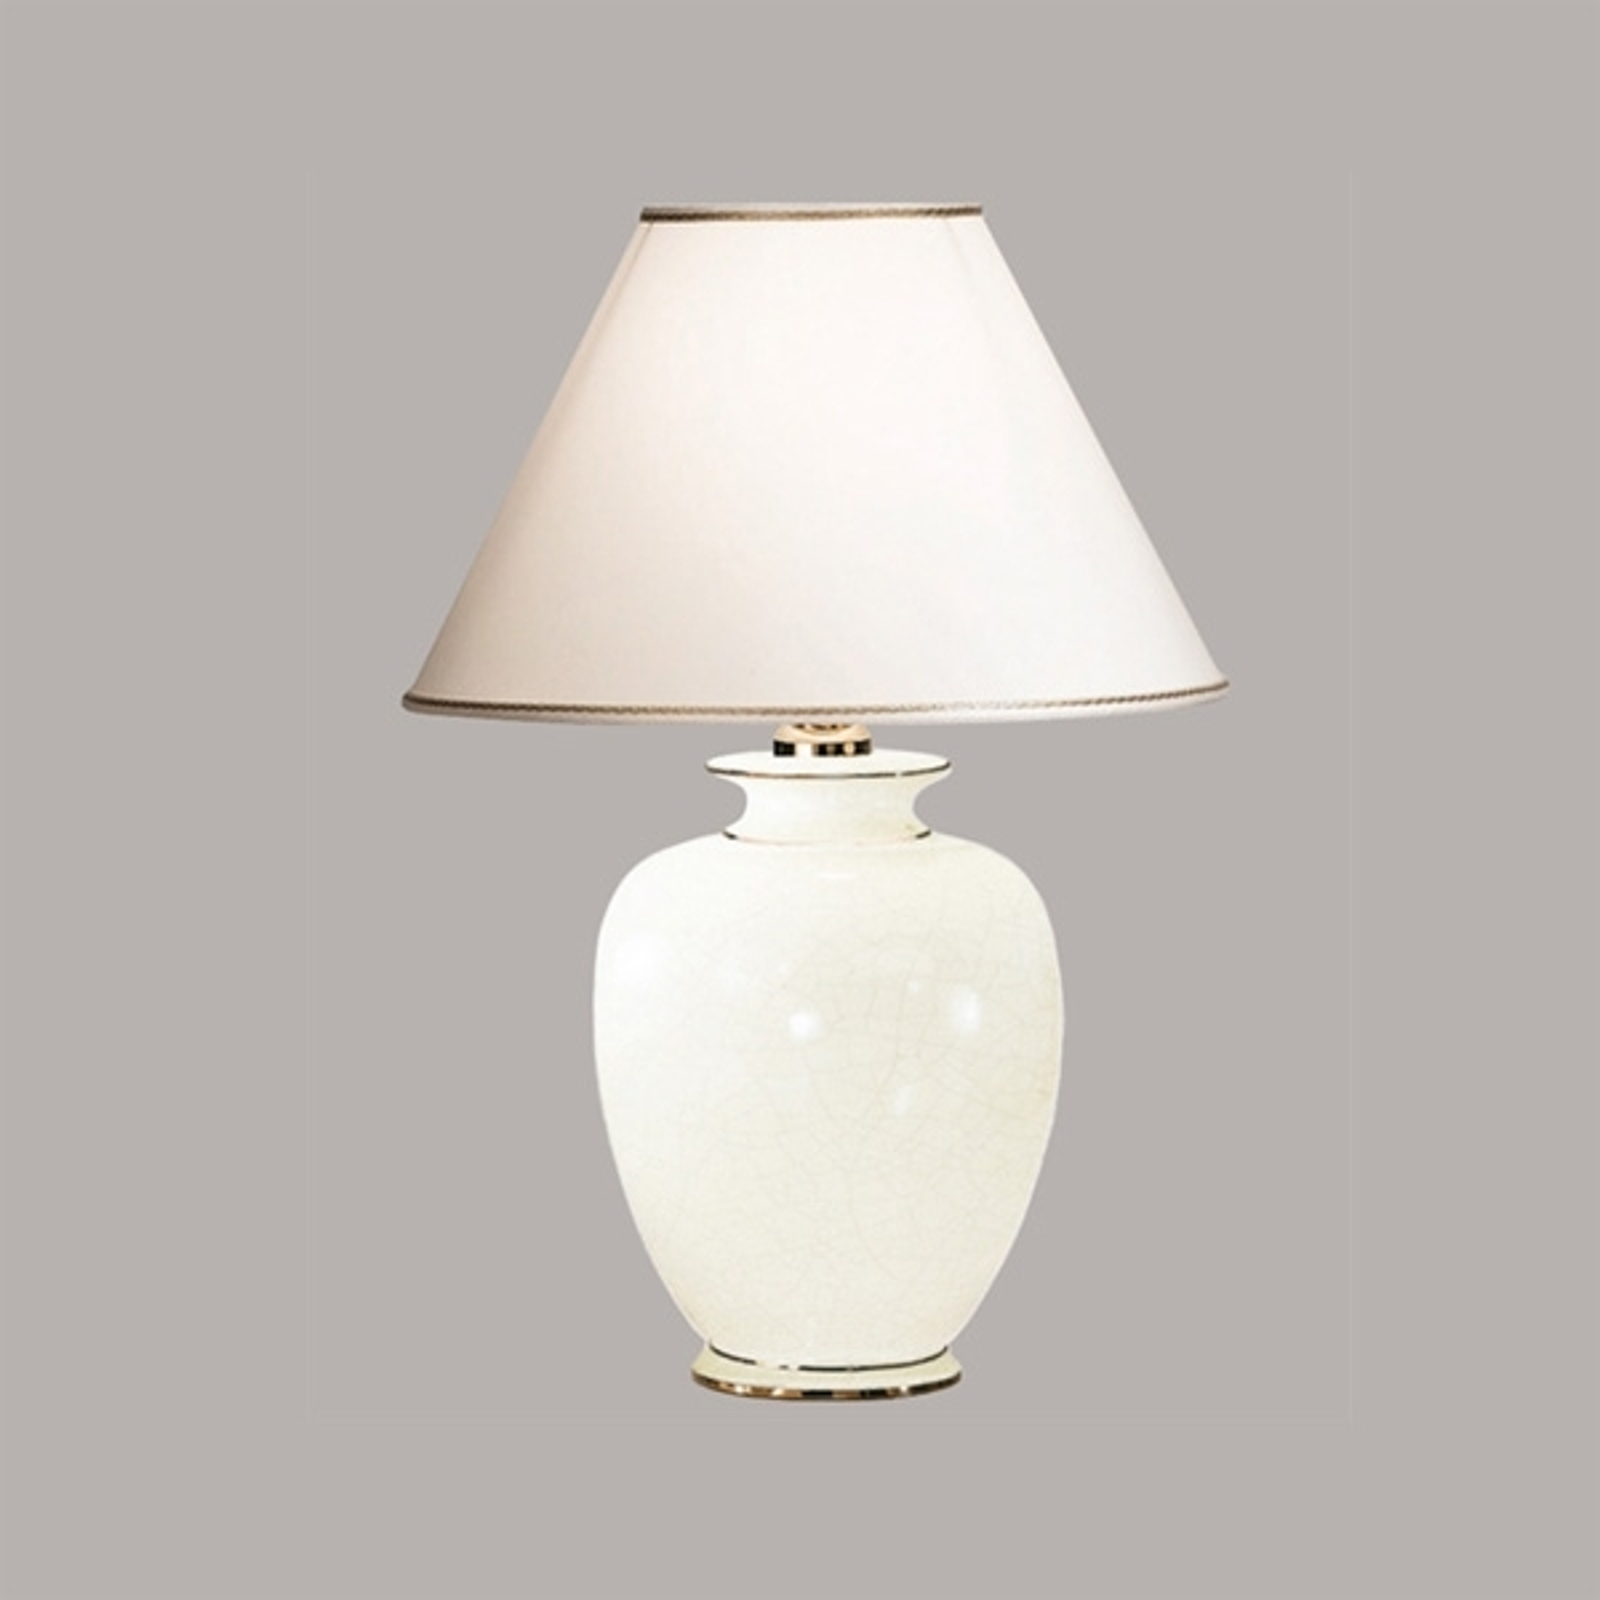 Lampe à poser blanche GIARDINO CRACLEE 40 cm